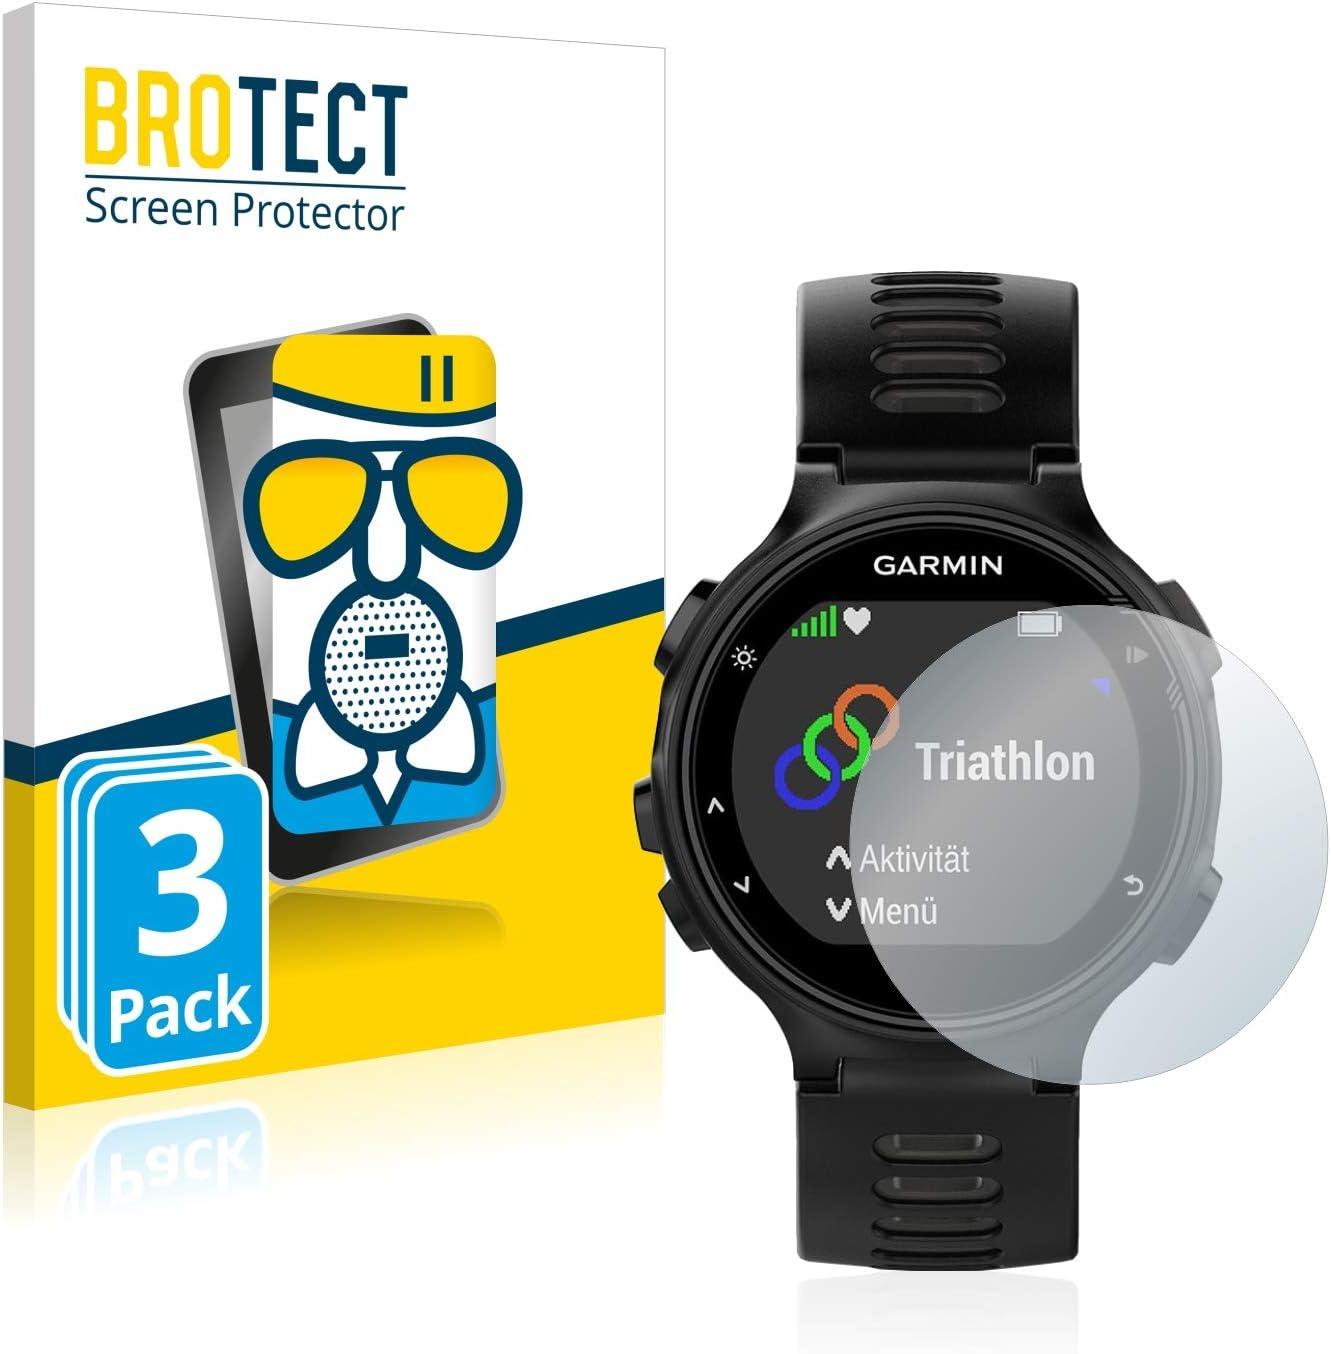 Film Protecteur Vitre 9H brotect Anti-Reflet Protection Ecran Verre Compatible avec Garmin Forerunner 945 Mat